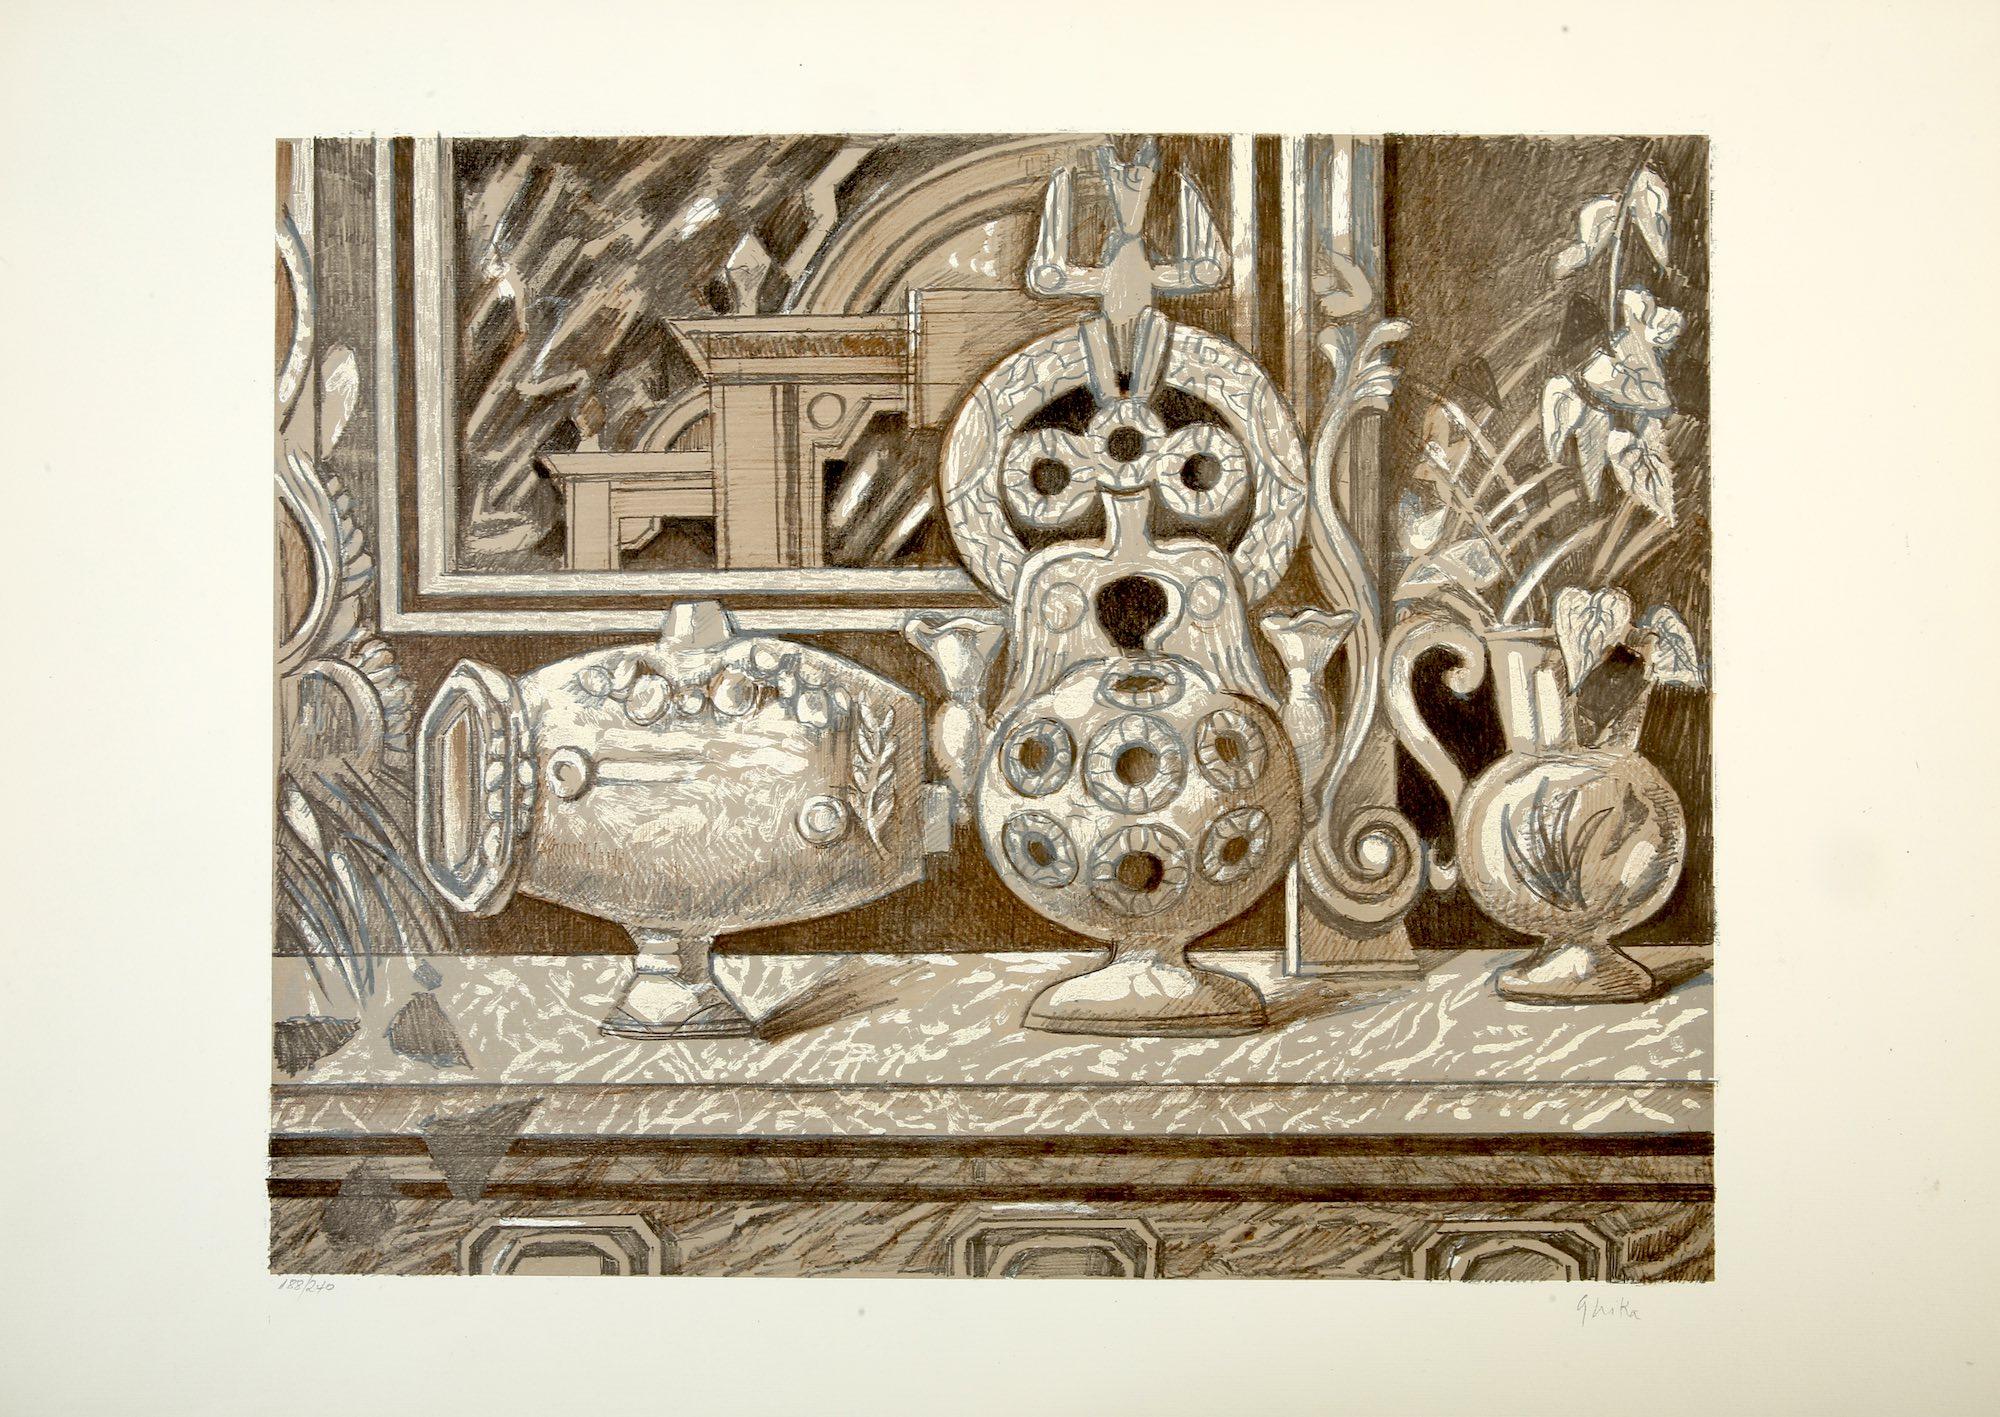 Nikos Hadjikyriakos-Ghika   Still life with Çanakkale pottery